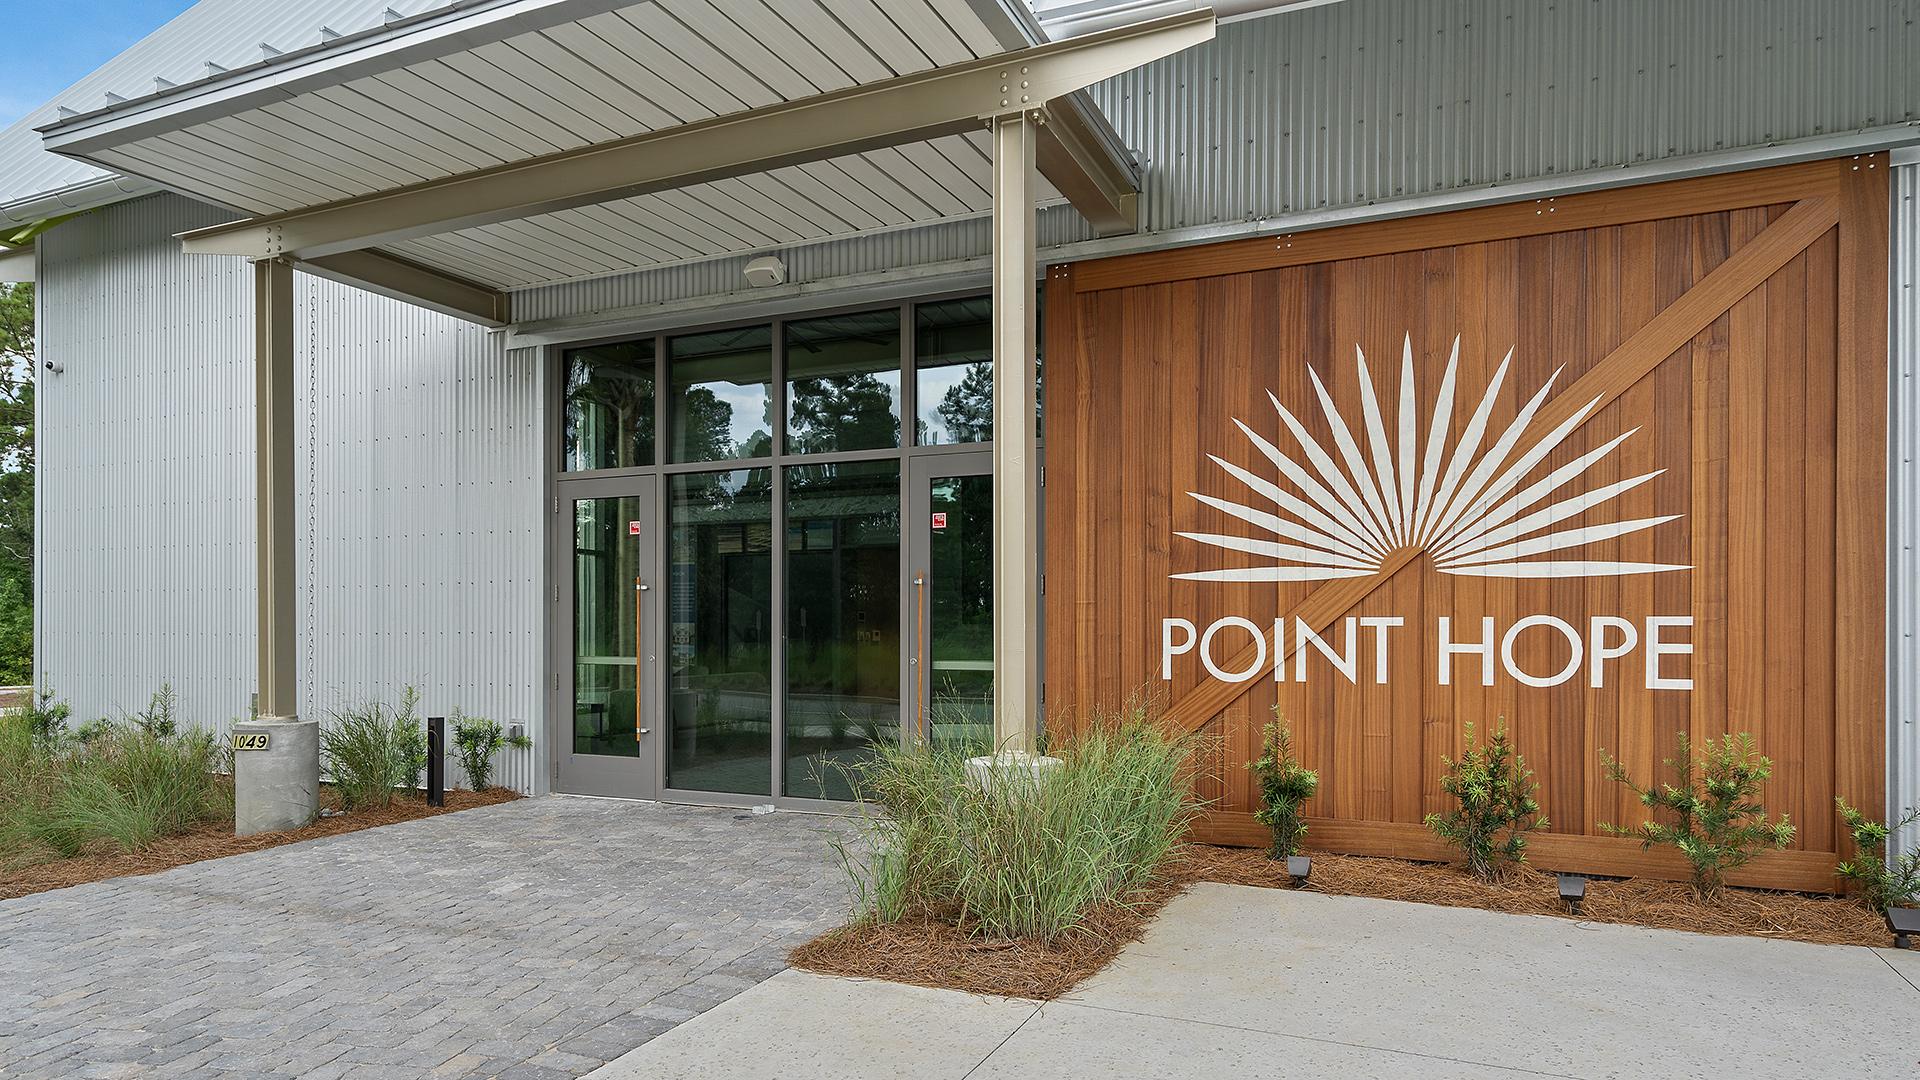 The HUB Information Center